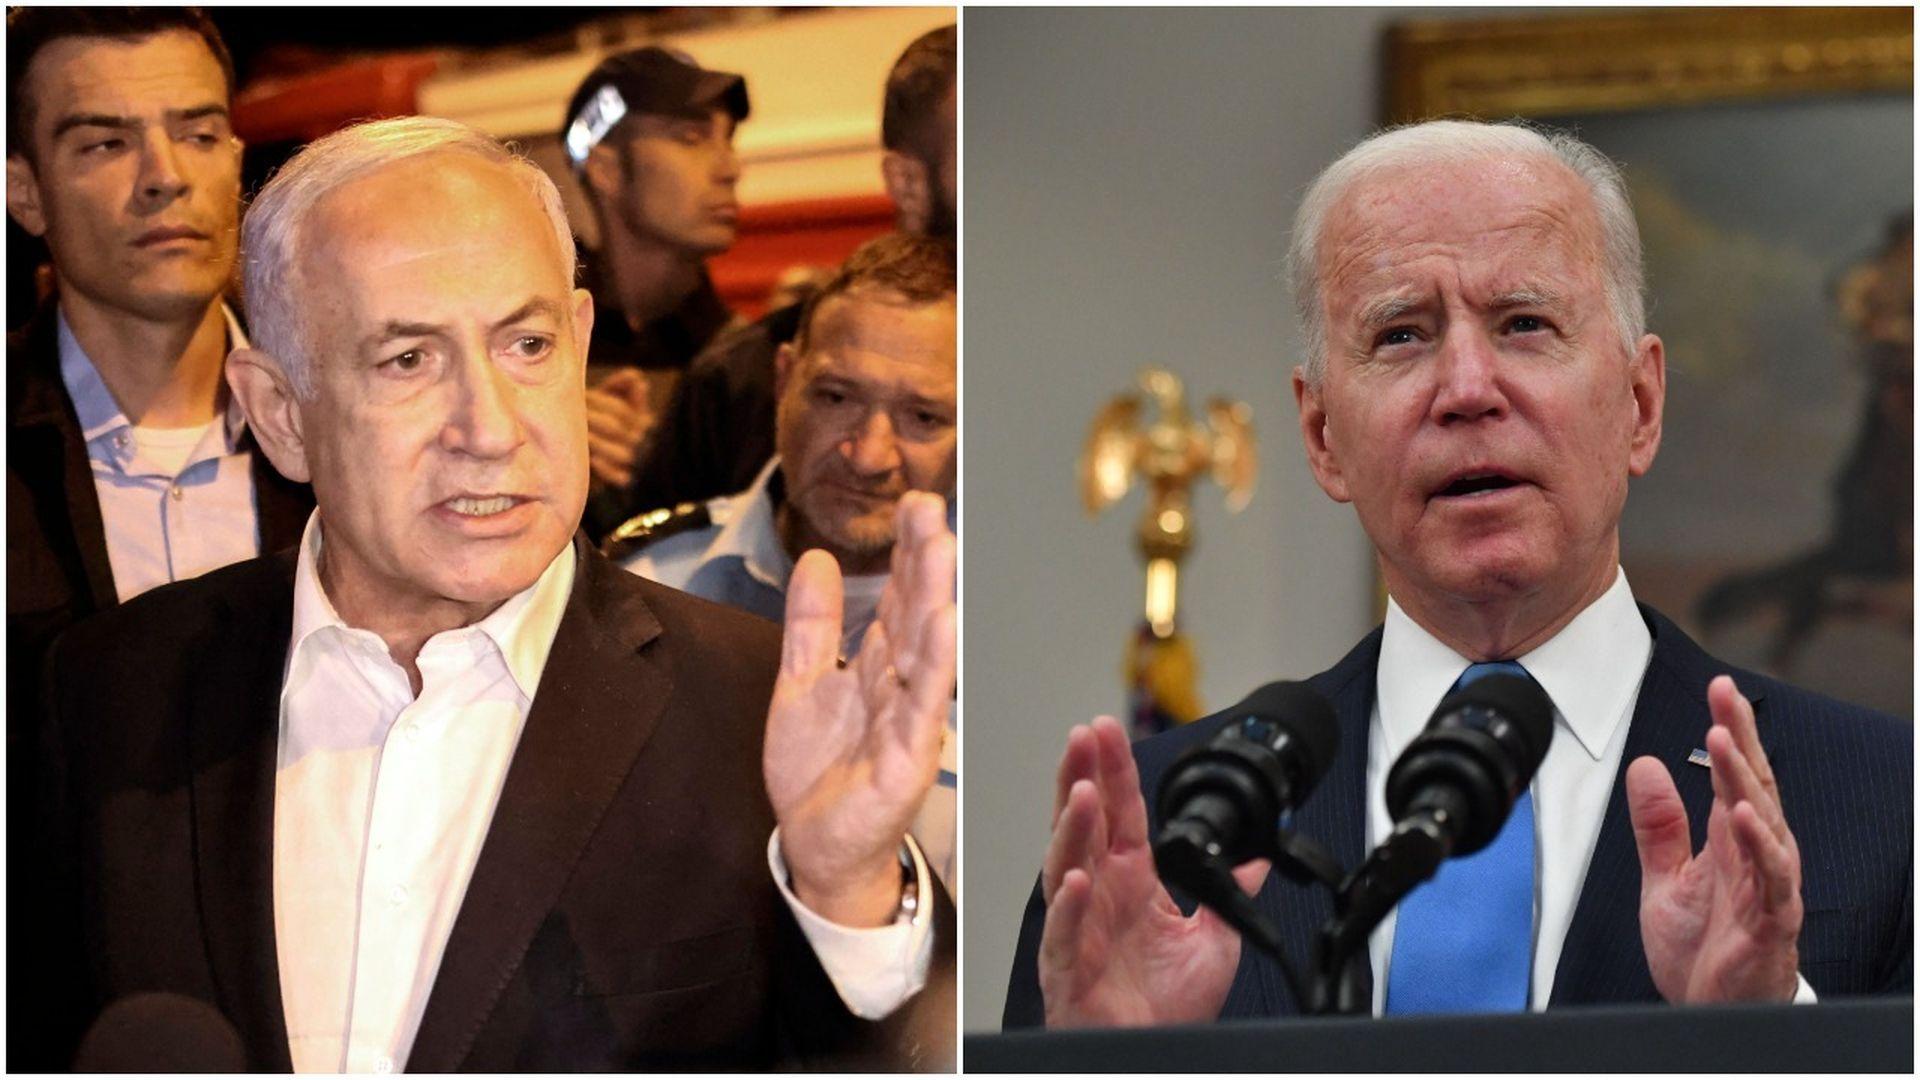 Netanyahu and Biden